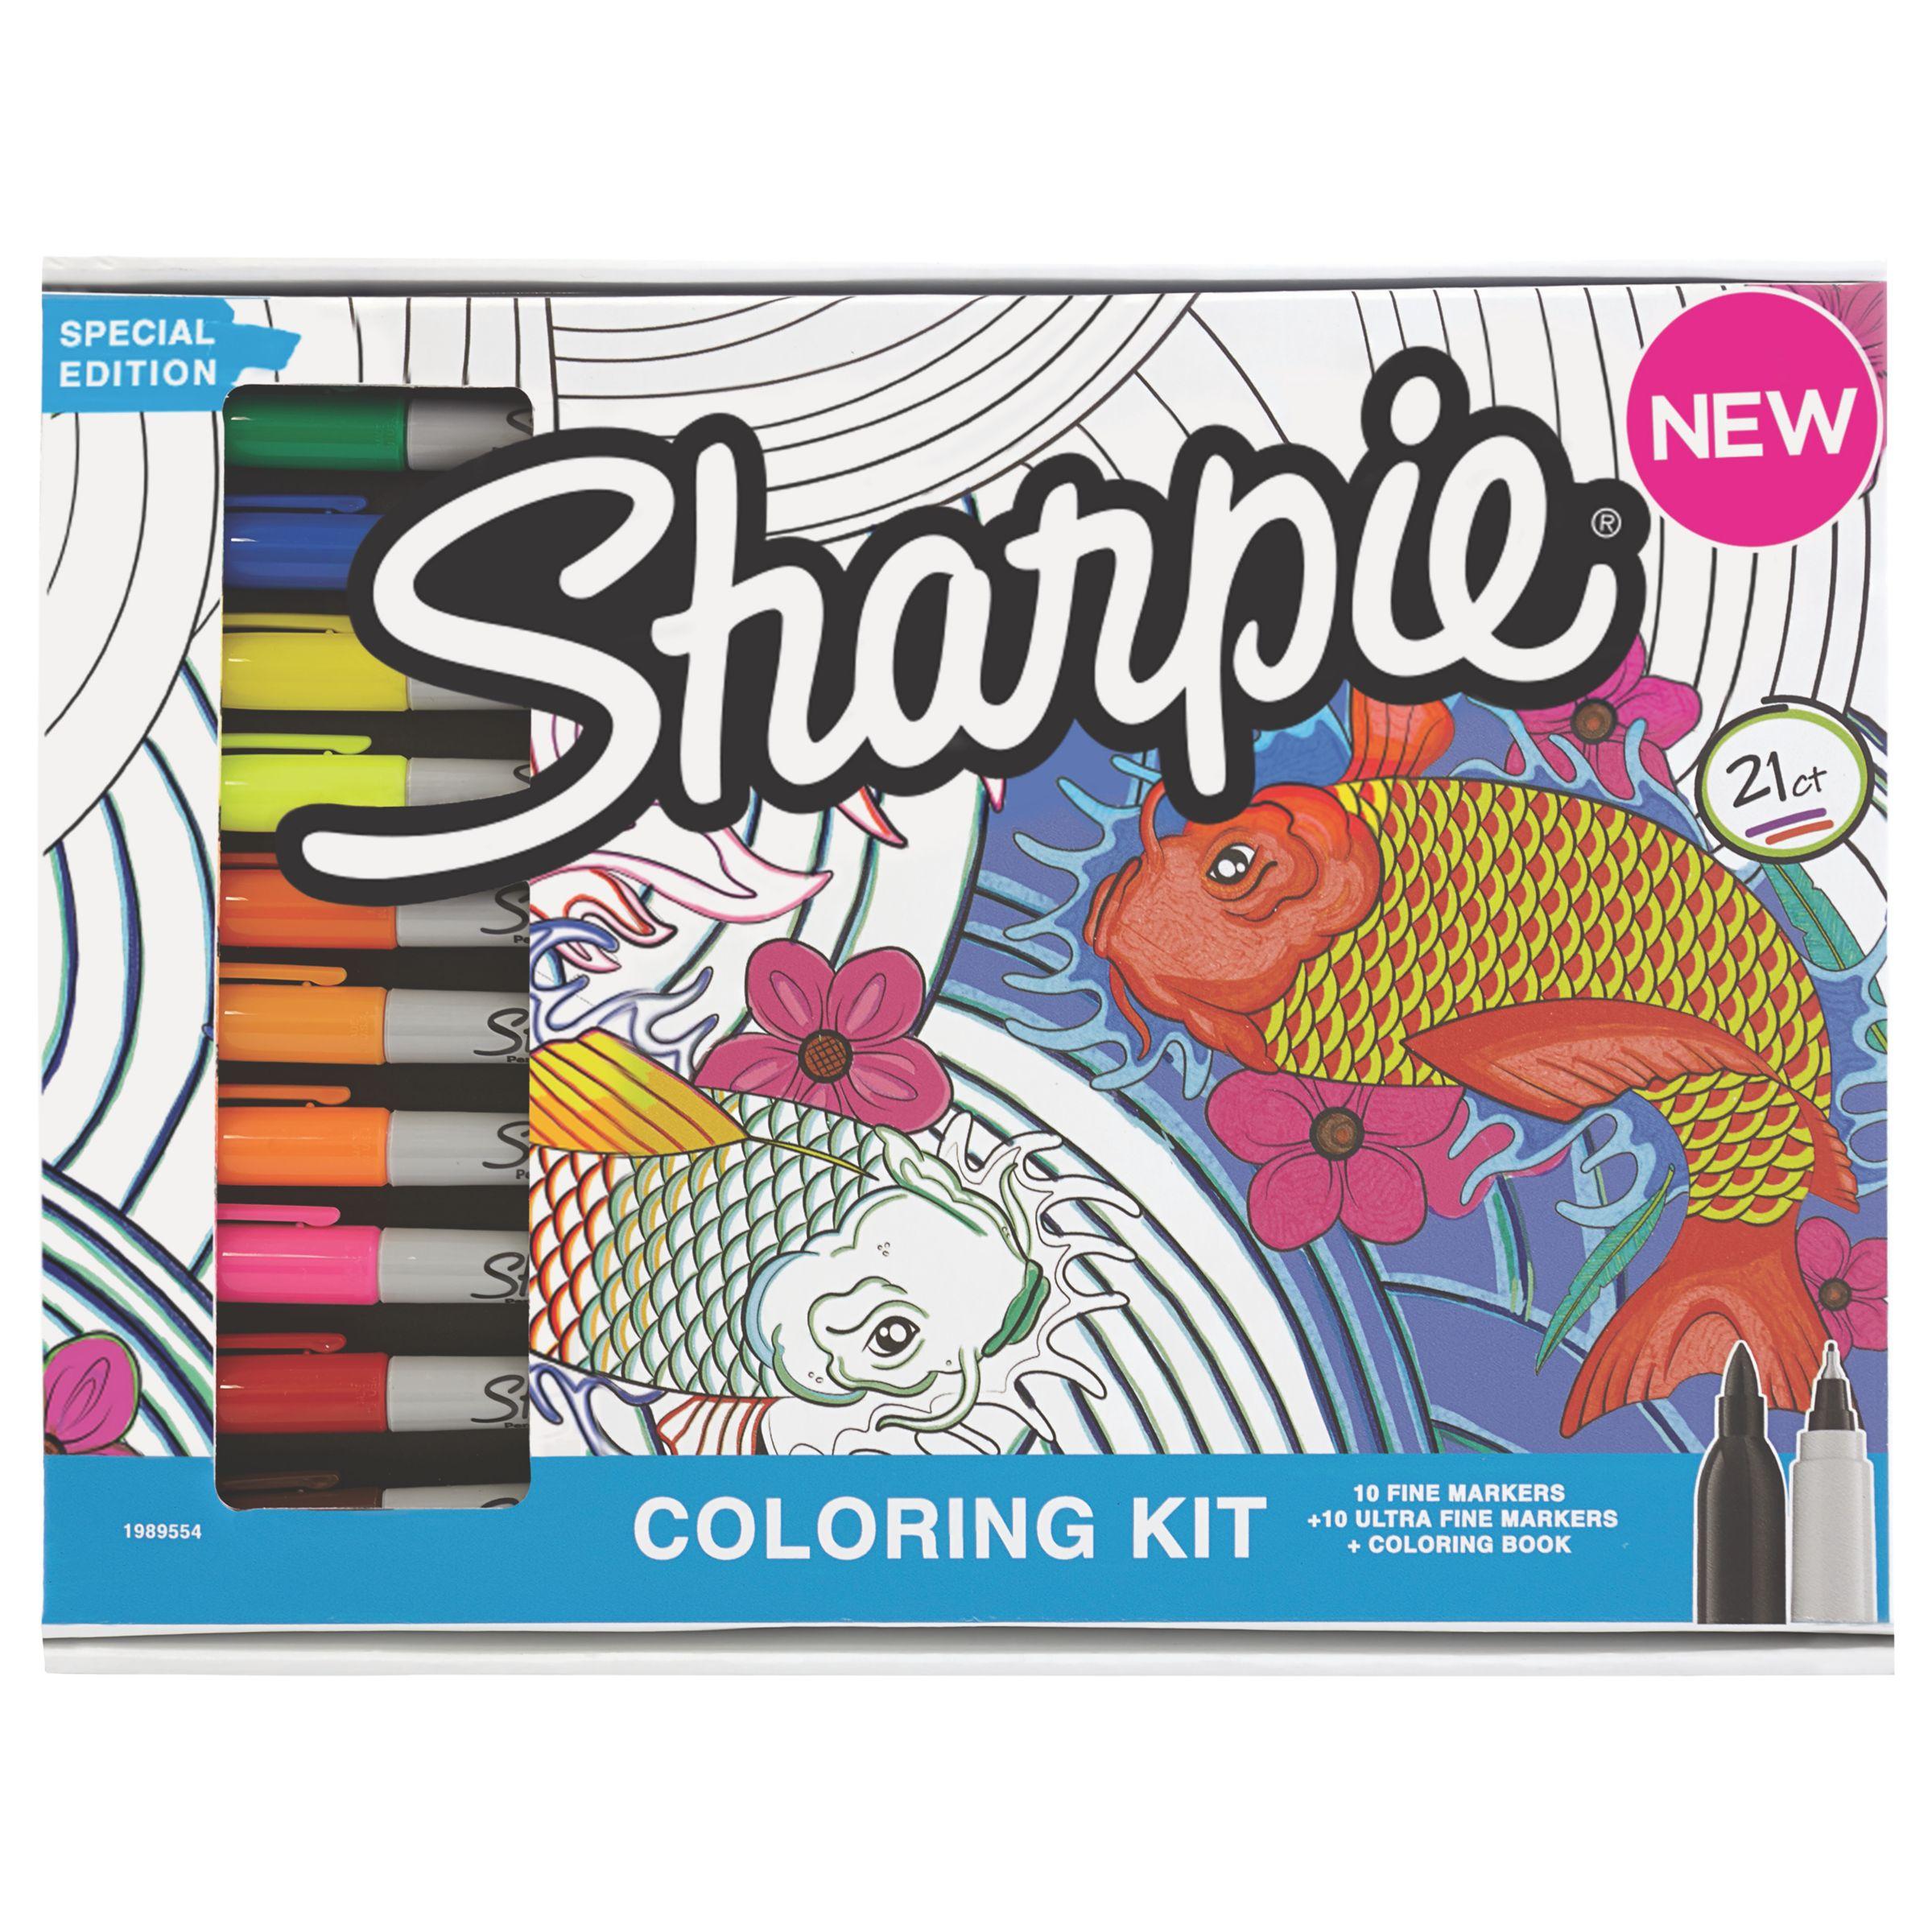 Sharpie Sharpie Colouring Kit, Pack of 20